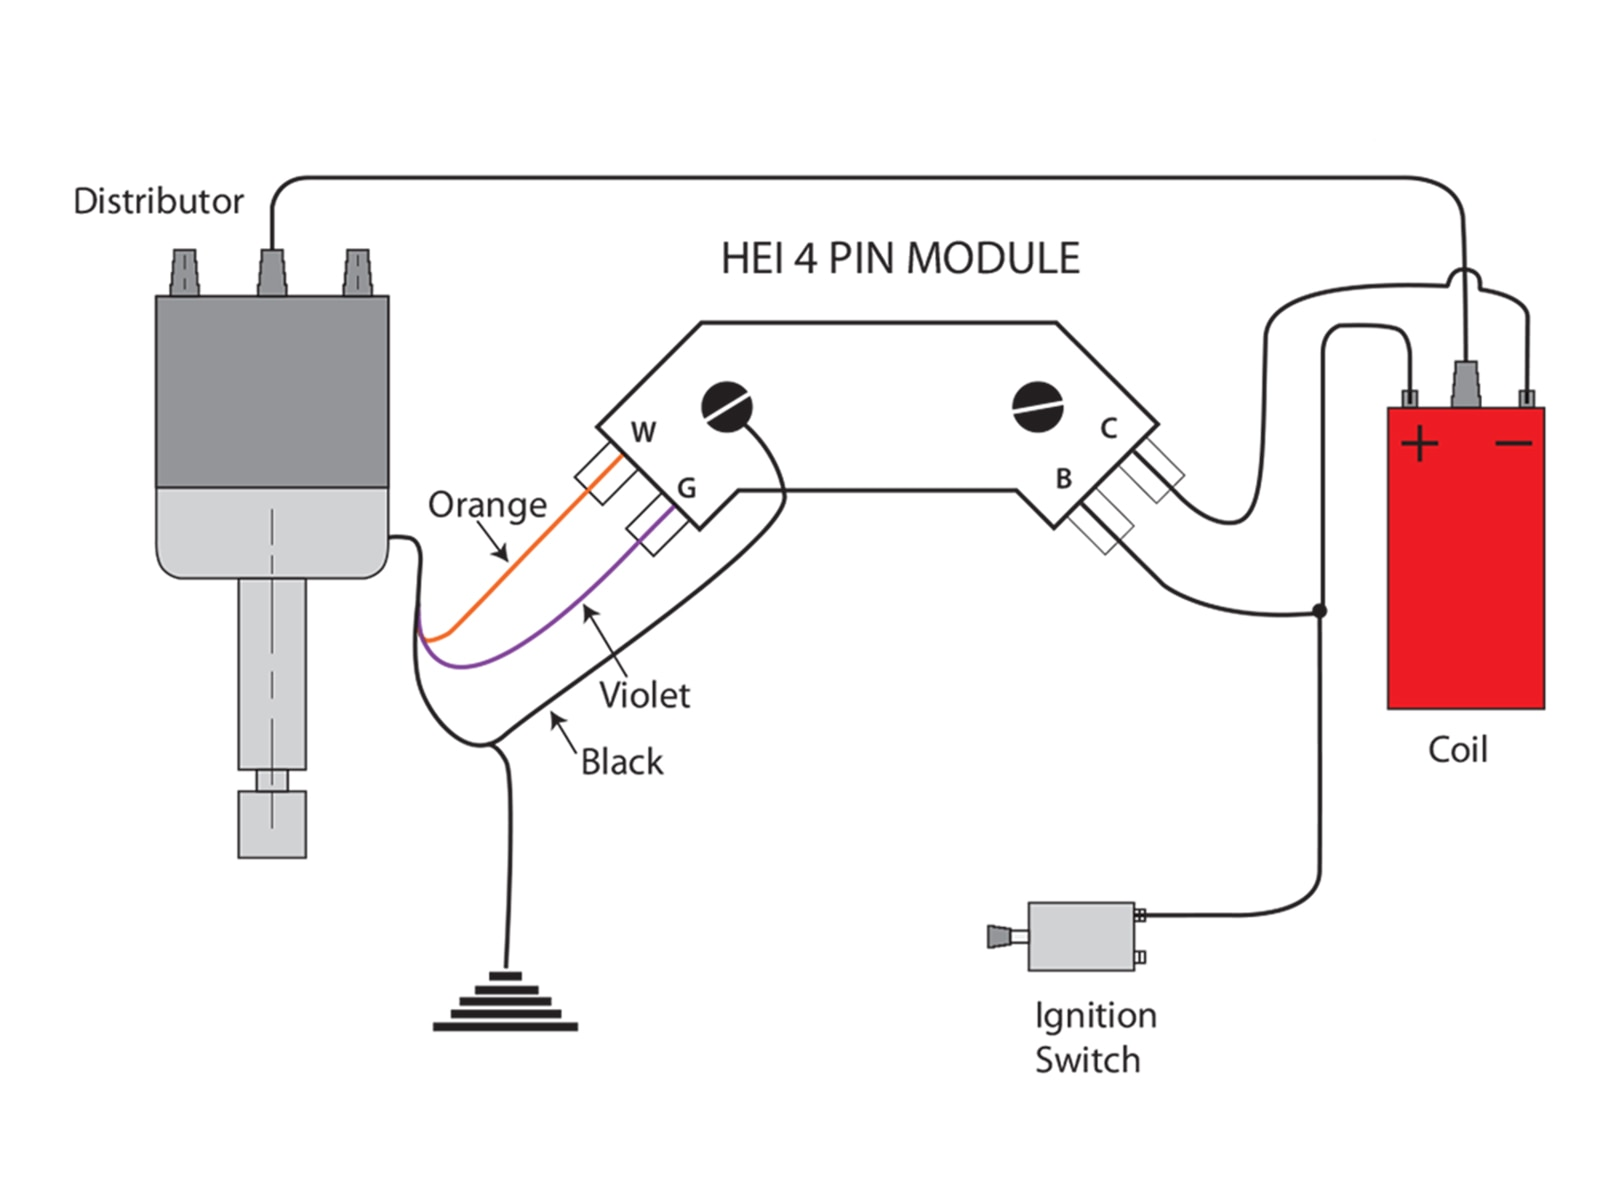 chevy hei distributor module wiring diagram - wiring diagram seat-teta -  seat-teta.disnar.it  disnar.it